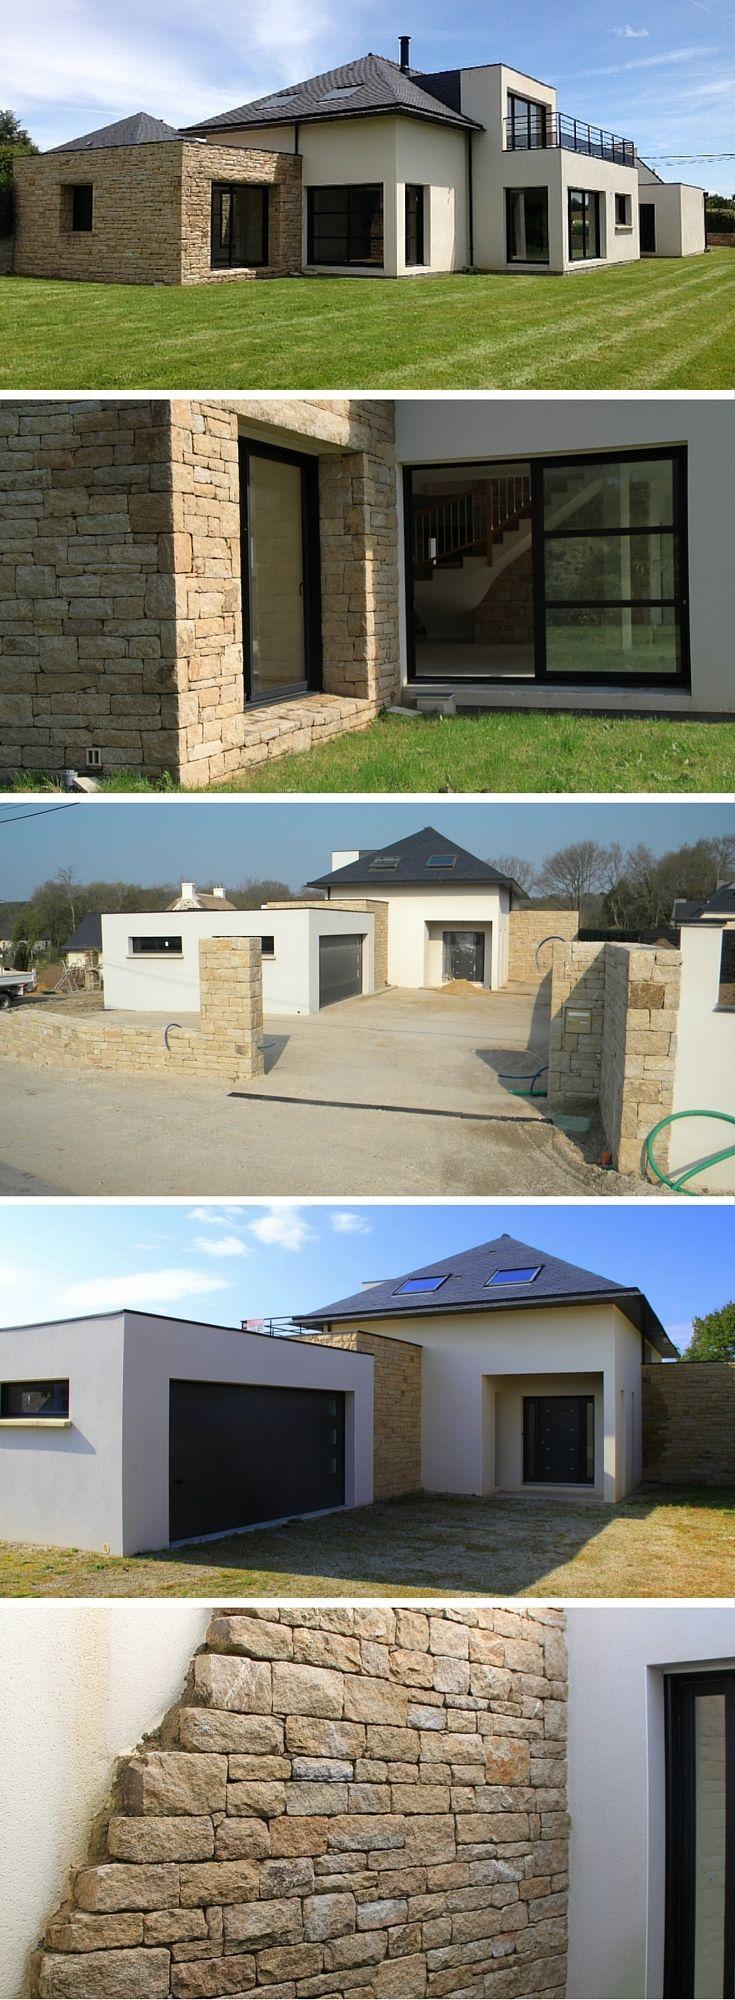 Mur en pierre maison fa ade maison moderne fa ade maison et maison - Maison en moellon ...